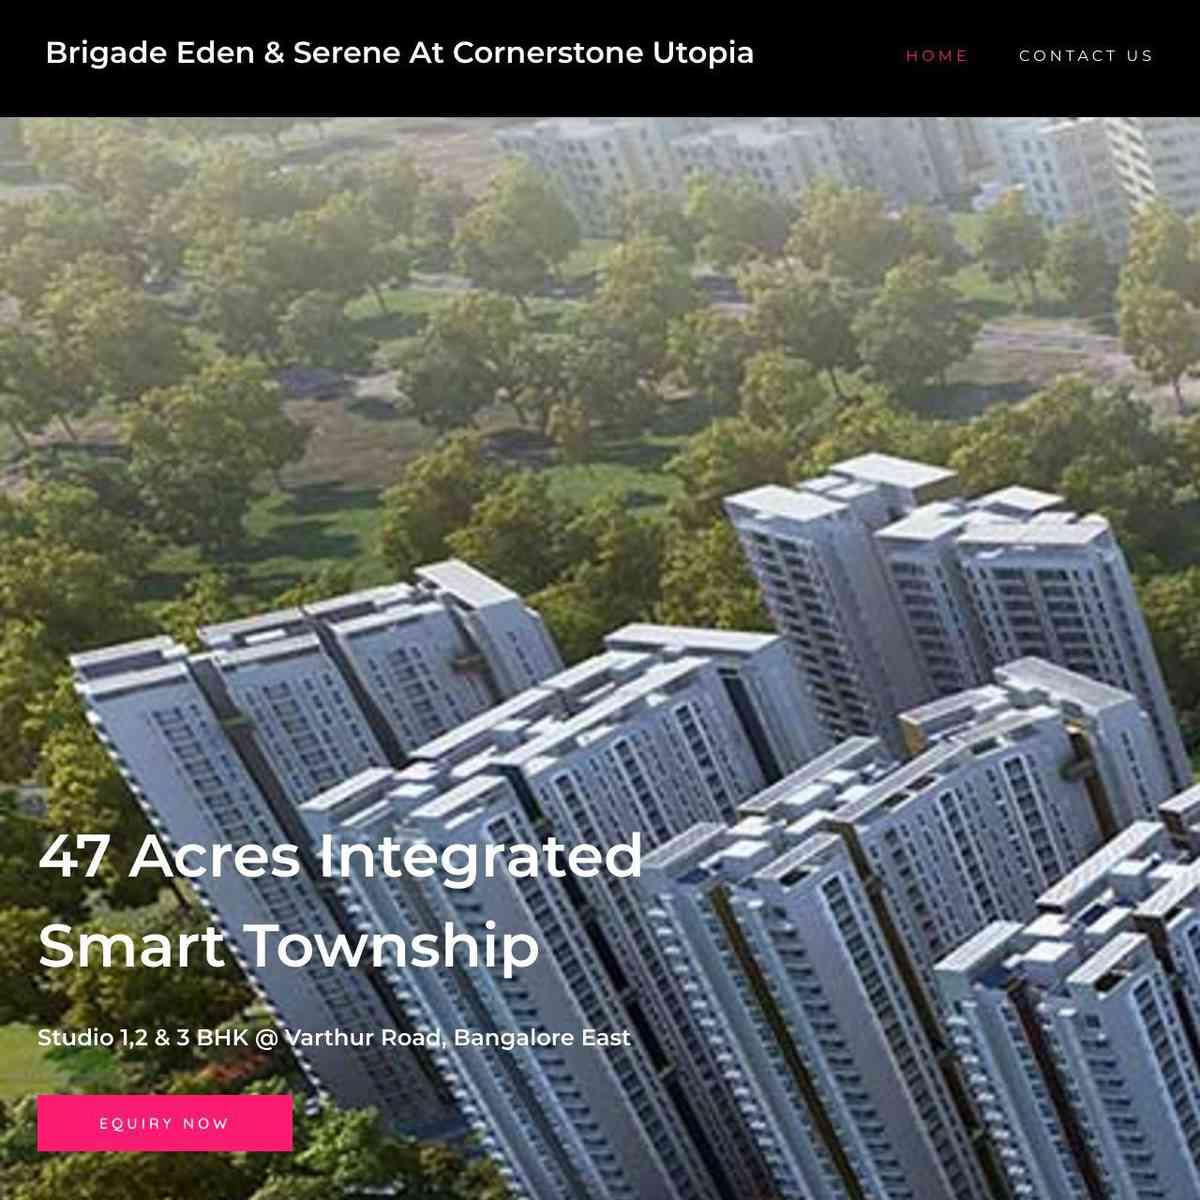 brigade-eden-serene-at-cornerstone-utopia.yolasite.com